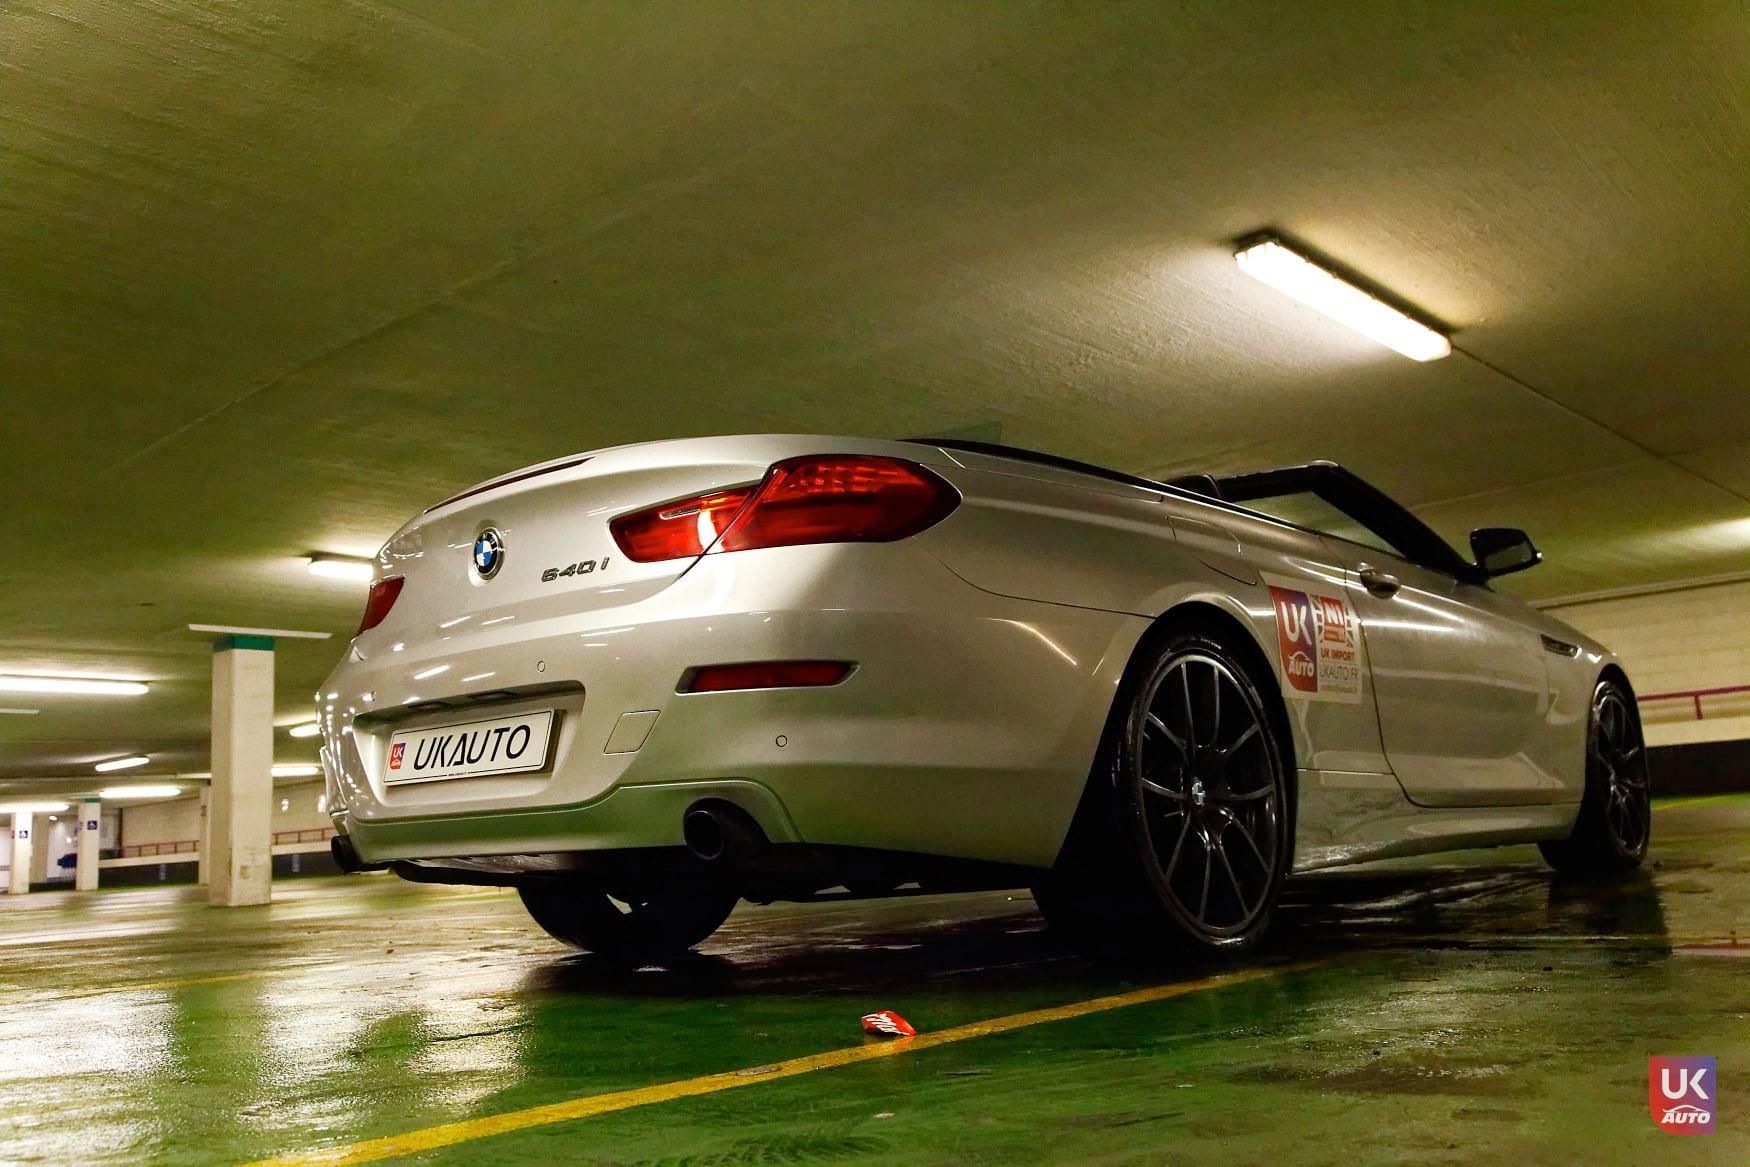 Importer voiture angleterre brexit 2021 BMW2 - Importer voiture angleterre brexit 2021 BMW